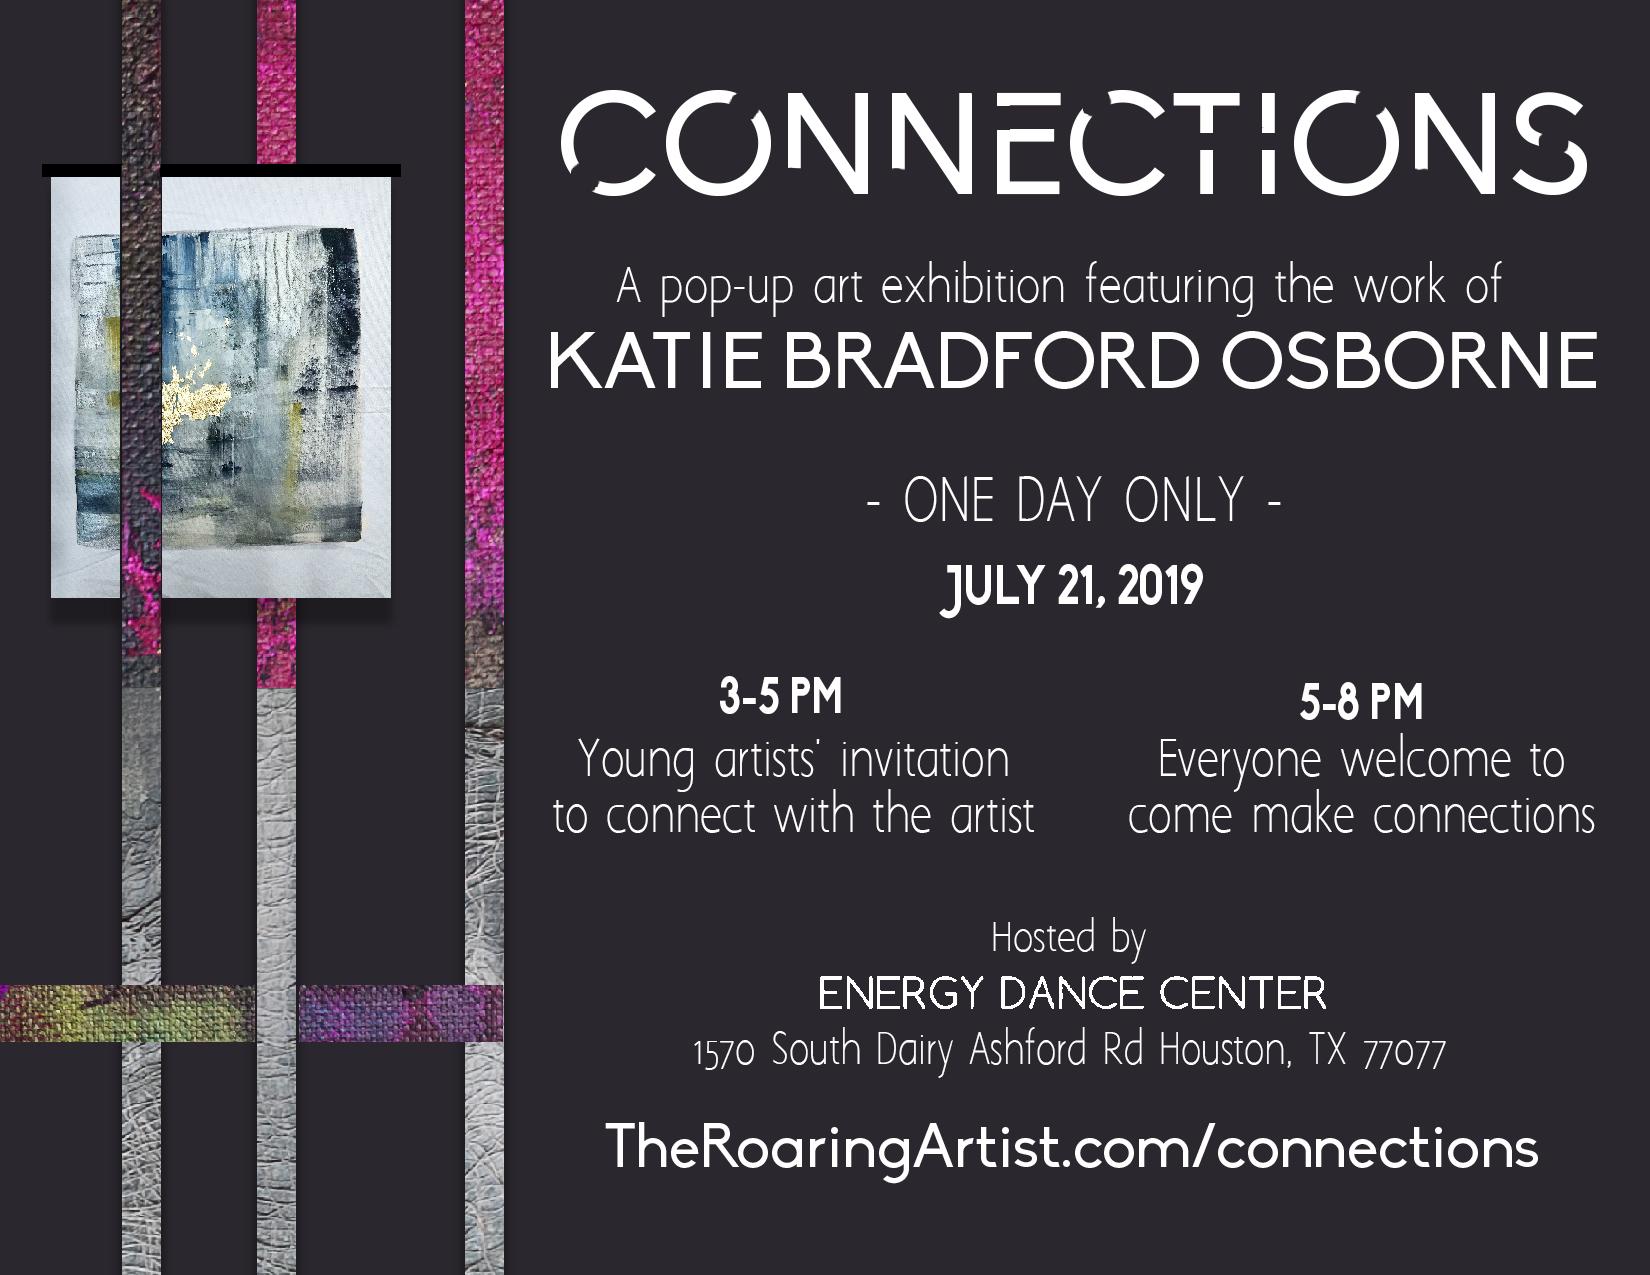 KatieBradfordOsborne_Connections.jpg